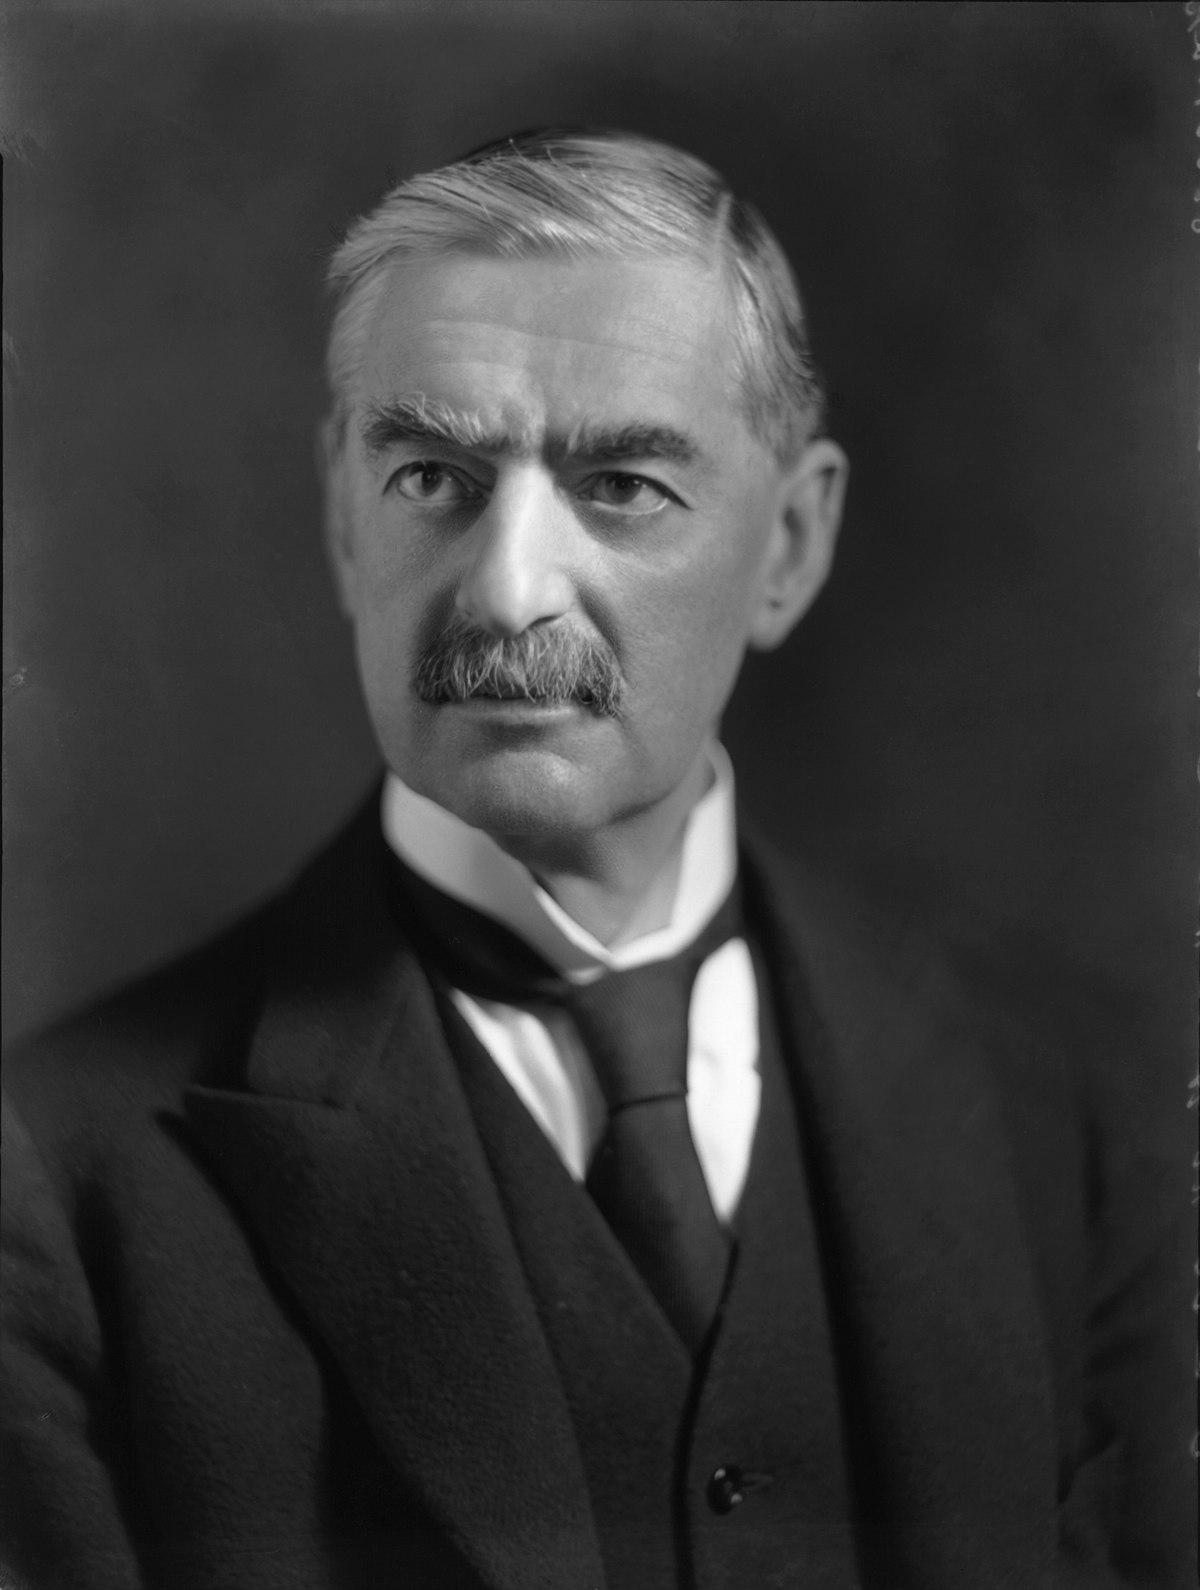 Neville Chamberlain - Wikipedia